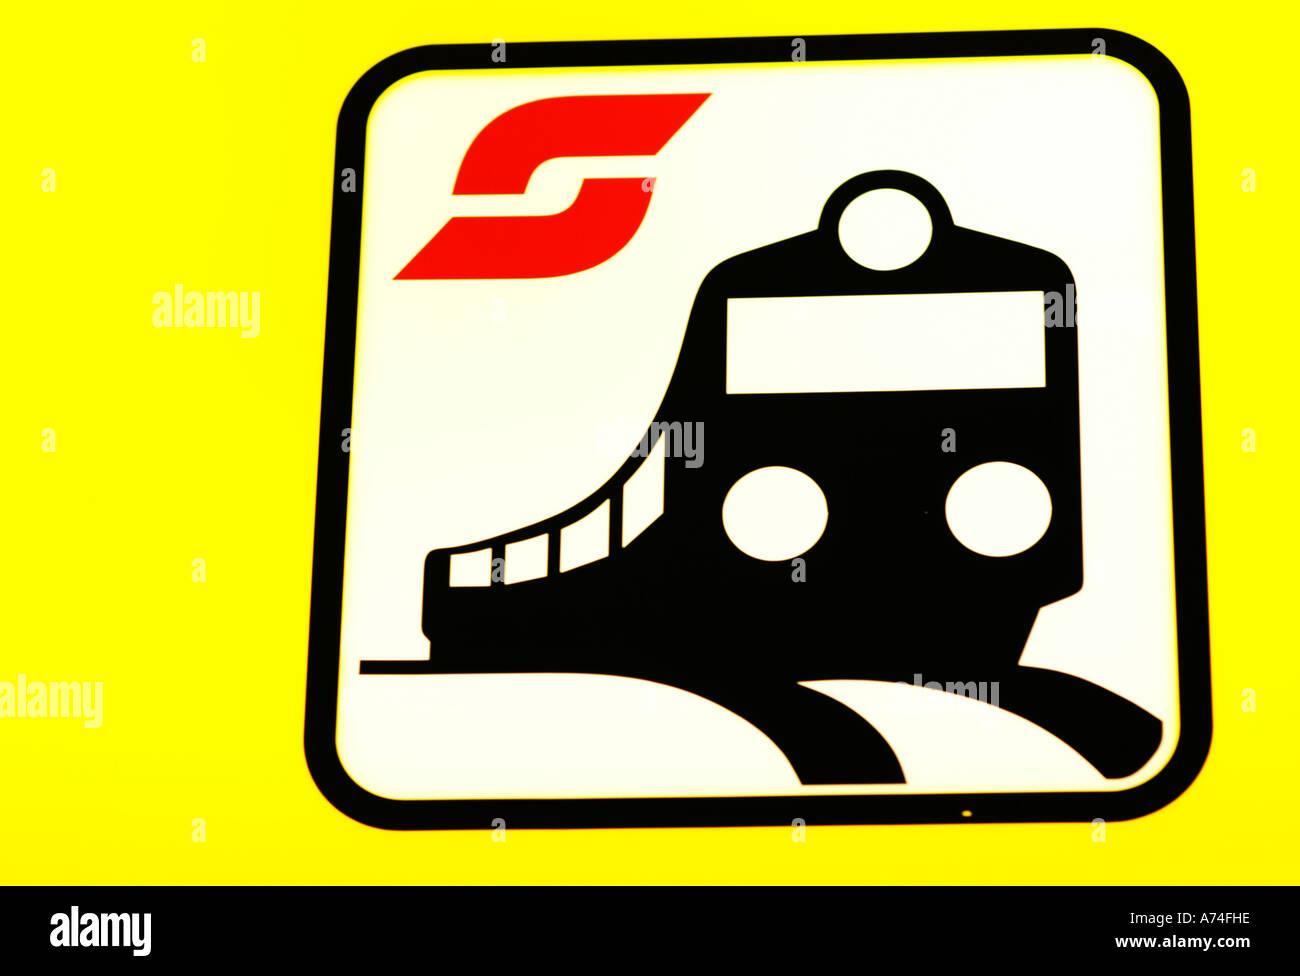 ÖBB, Austrian Railways, railway, sign - Stock Image